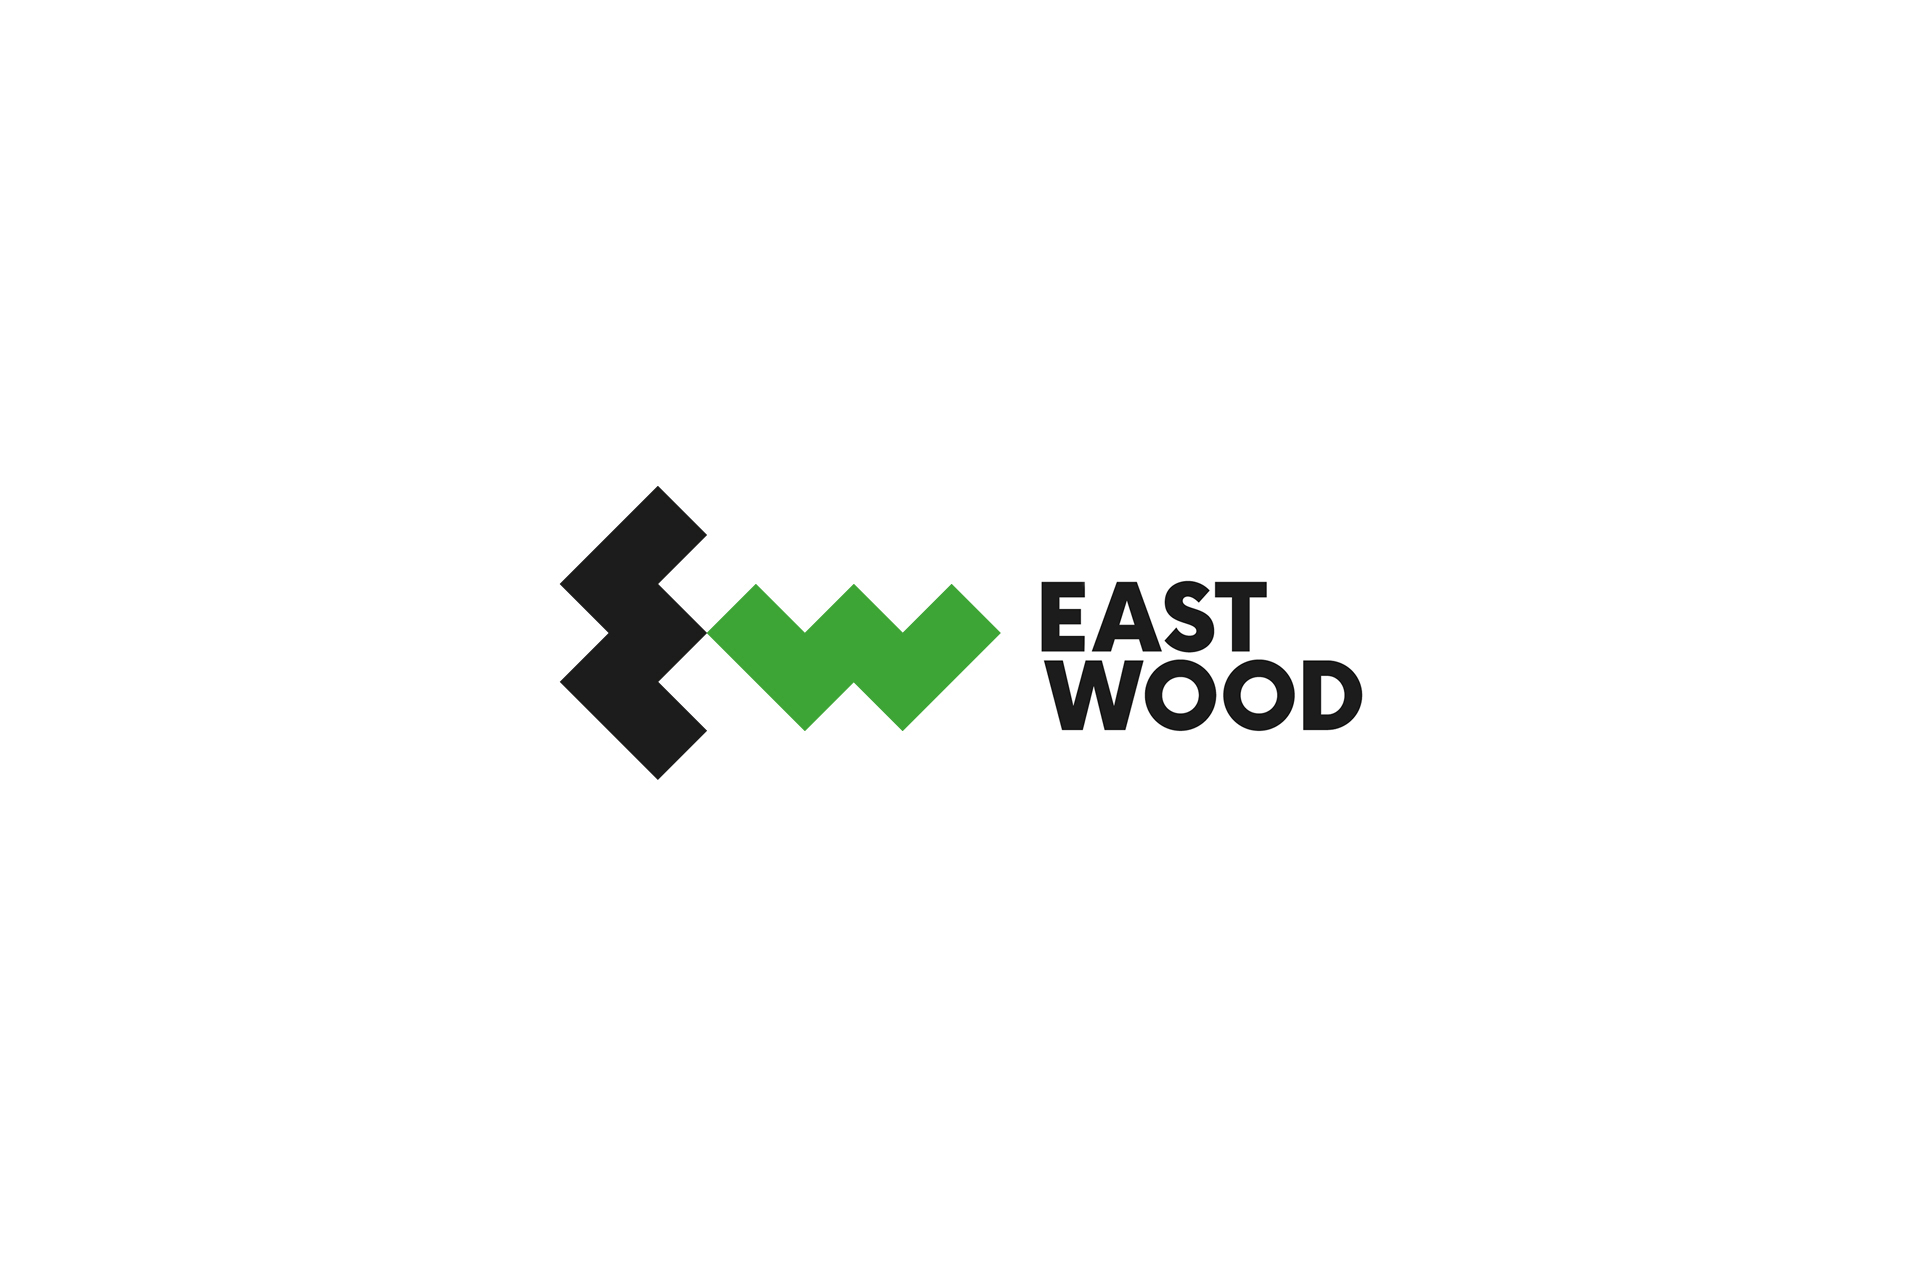 Asgard Branding, corporate identity, rebranding, Eastwood, logo, design, wood, timber